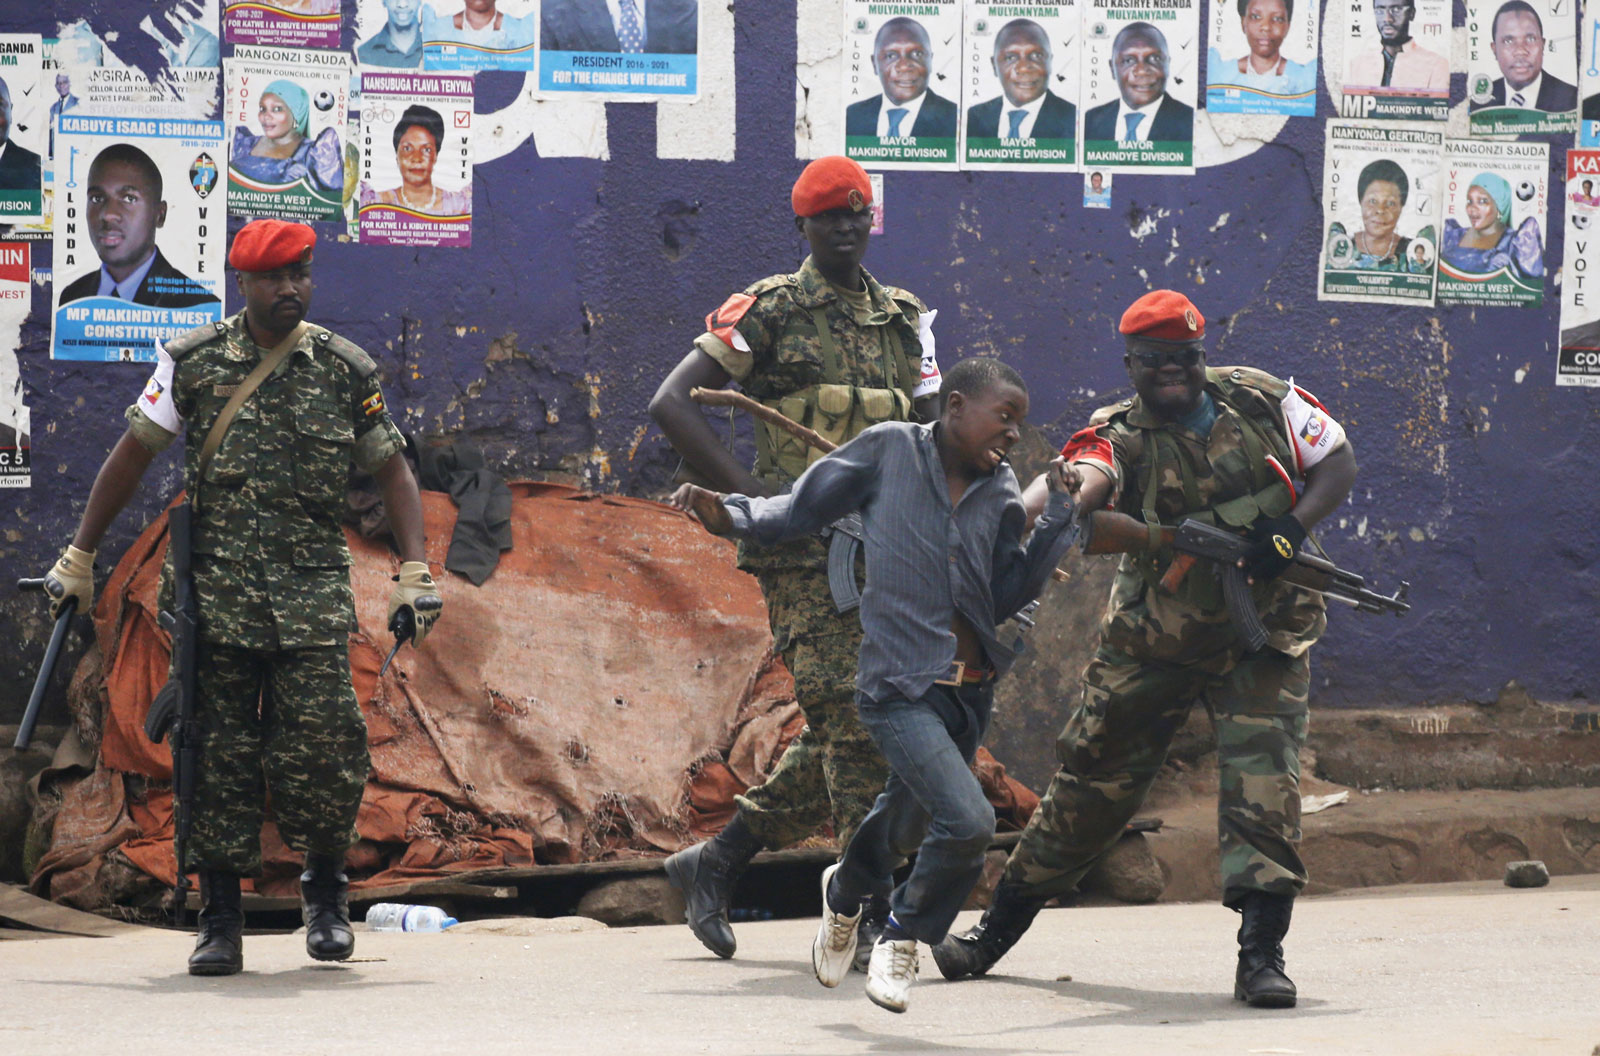 Uganda: The Cost of Fake Democracy | Pulitzer Center